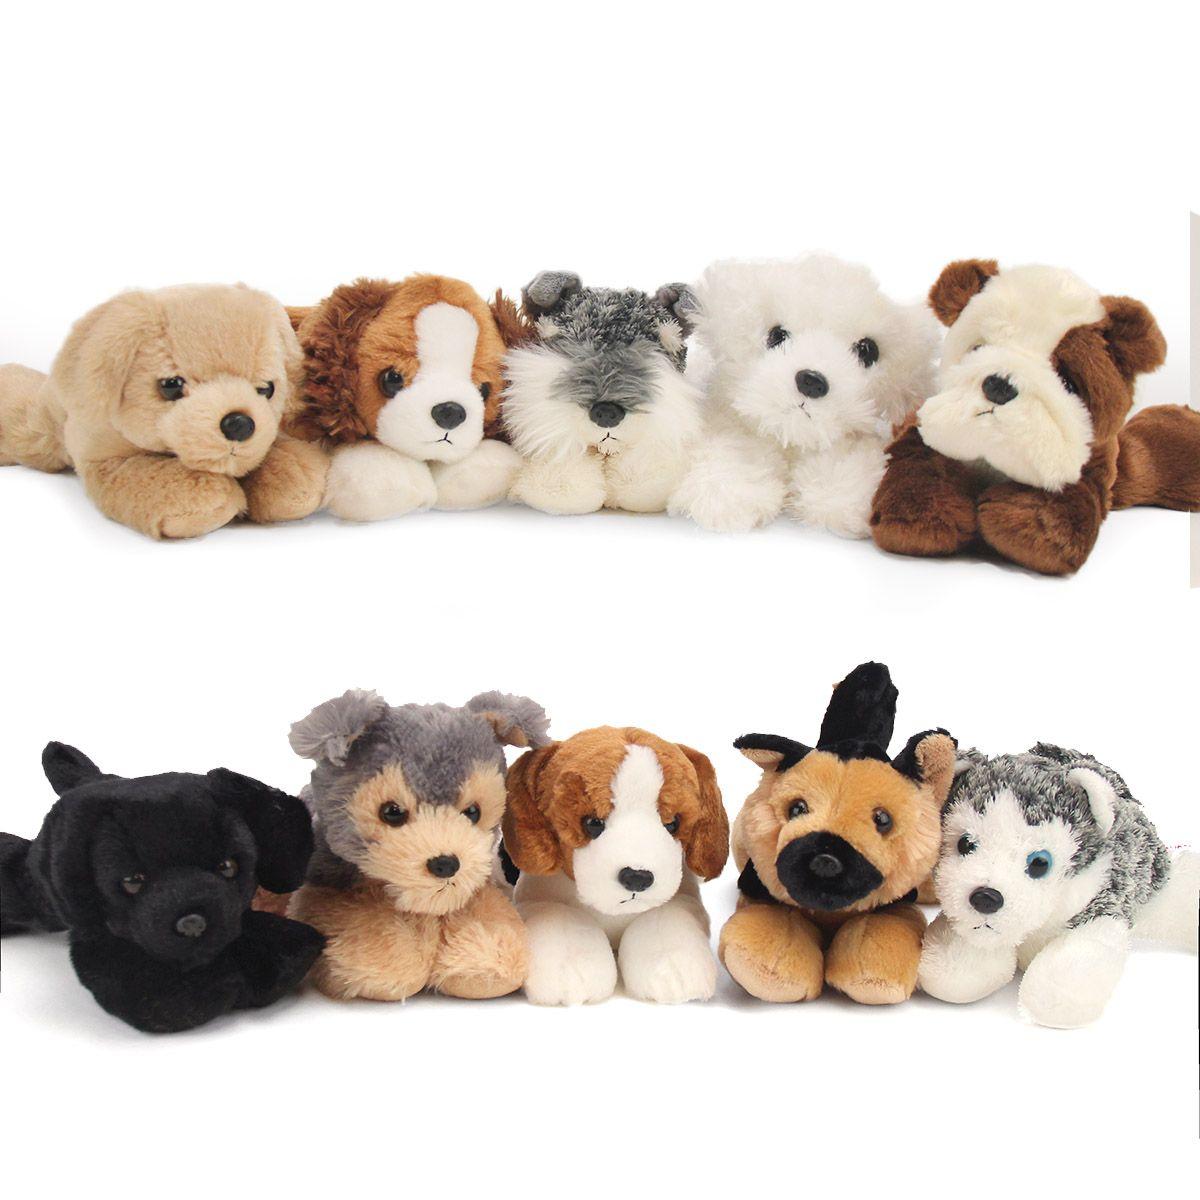 Stuffed Dogs Dog stuffed animal, Raining cats and dogs